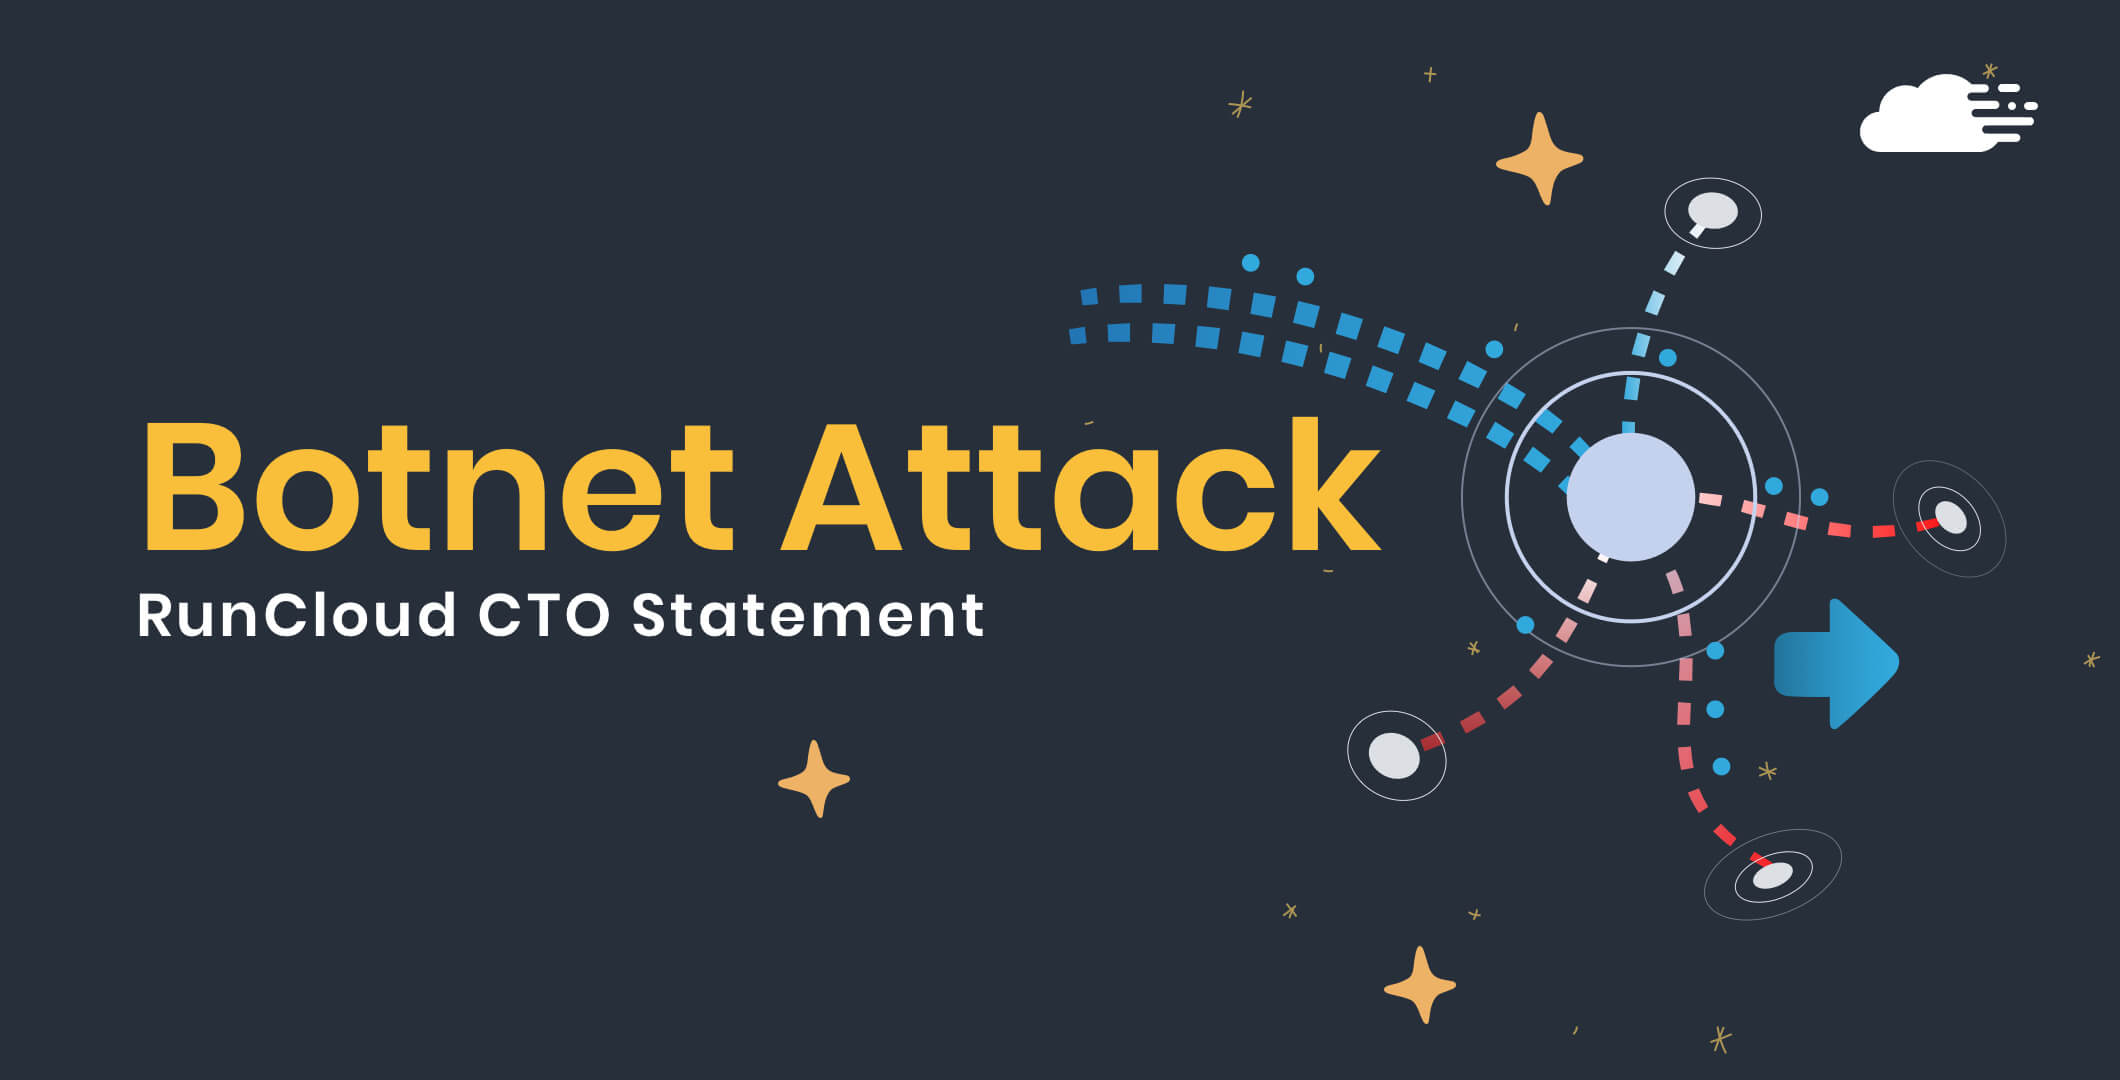 Botnet Attack - RunCloud CTO Statement - RunCloud